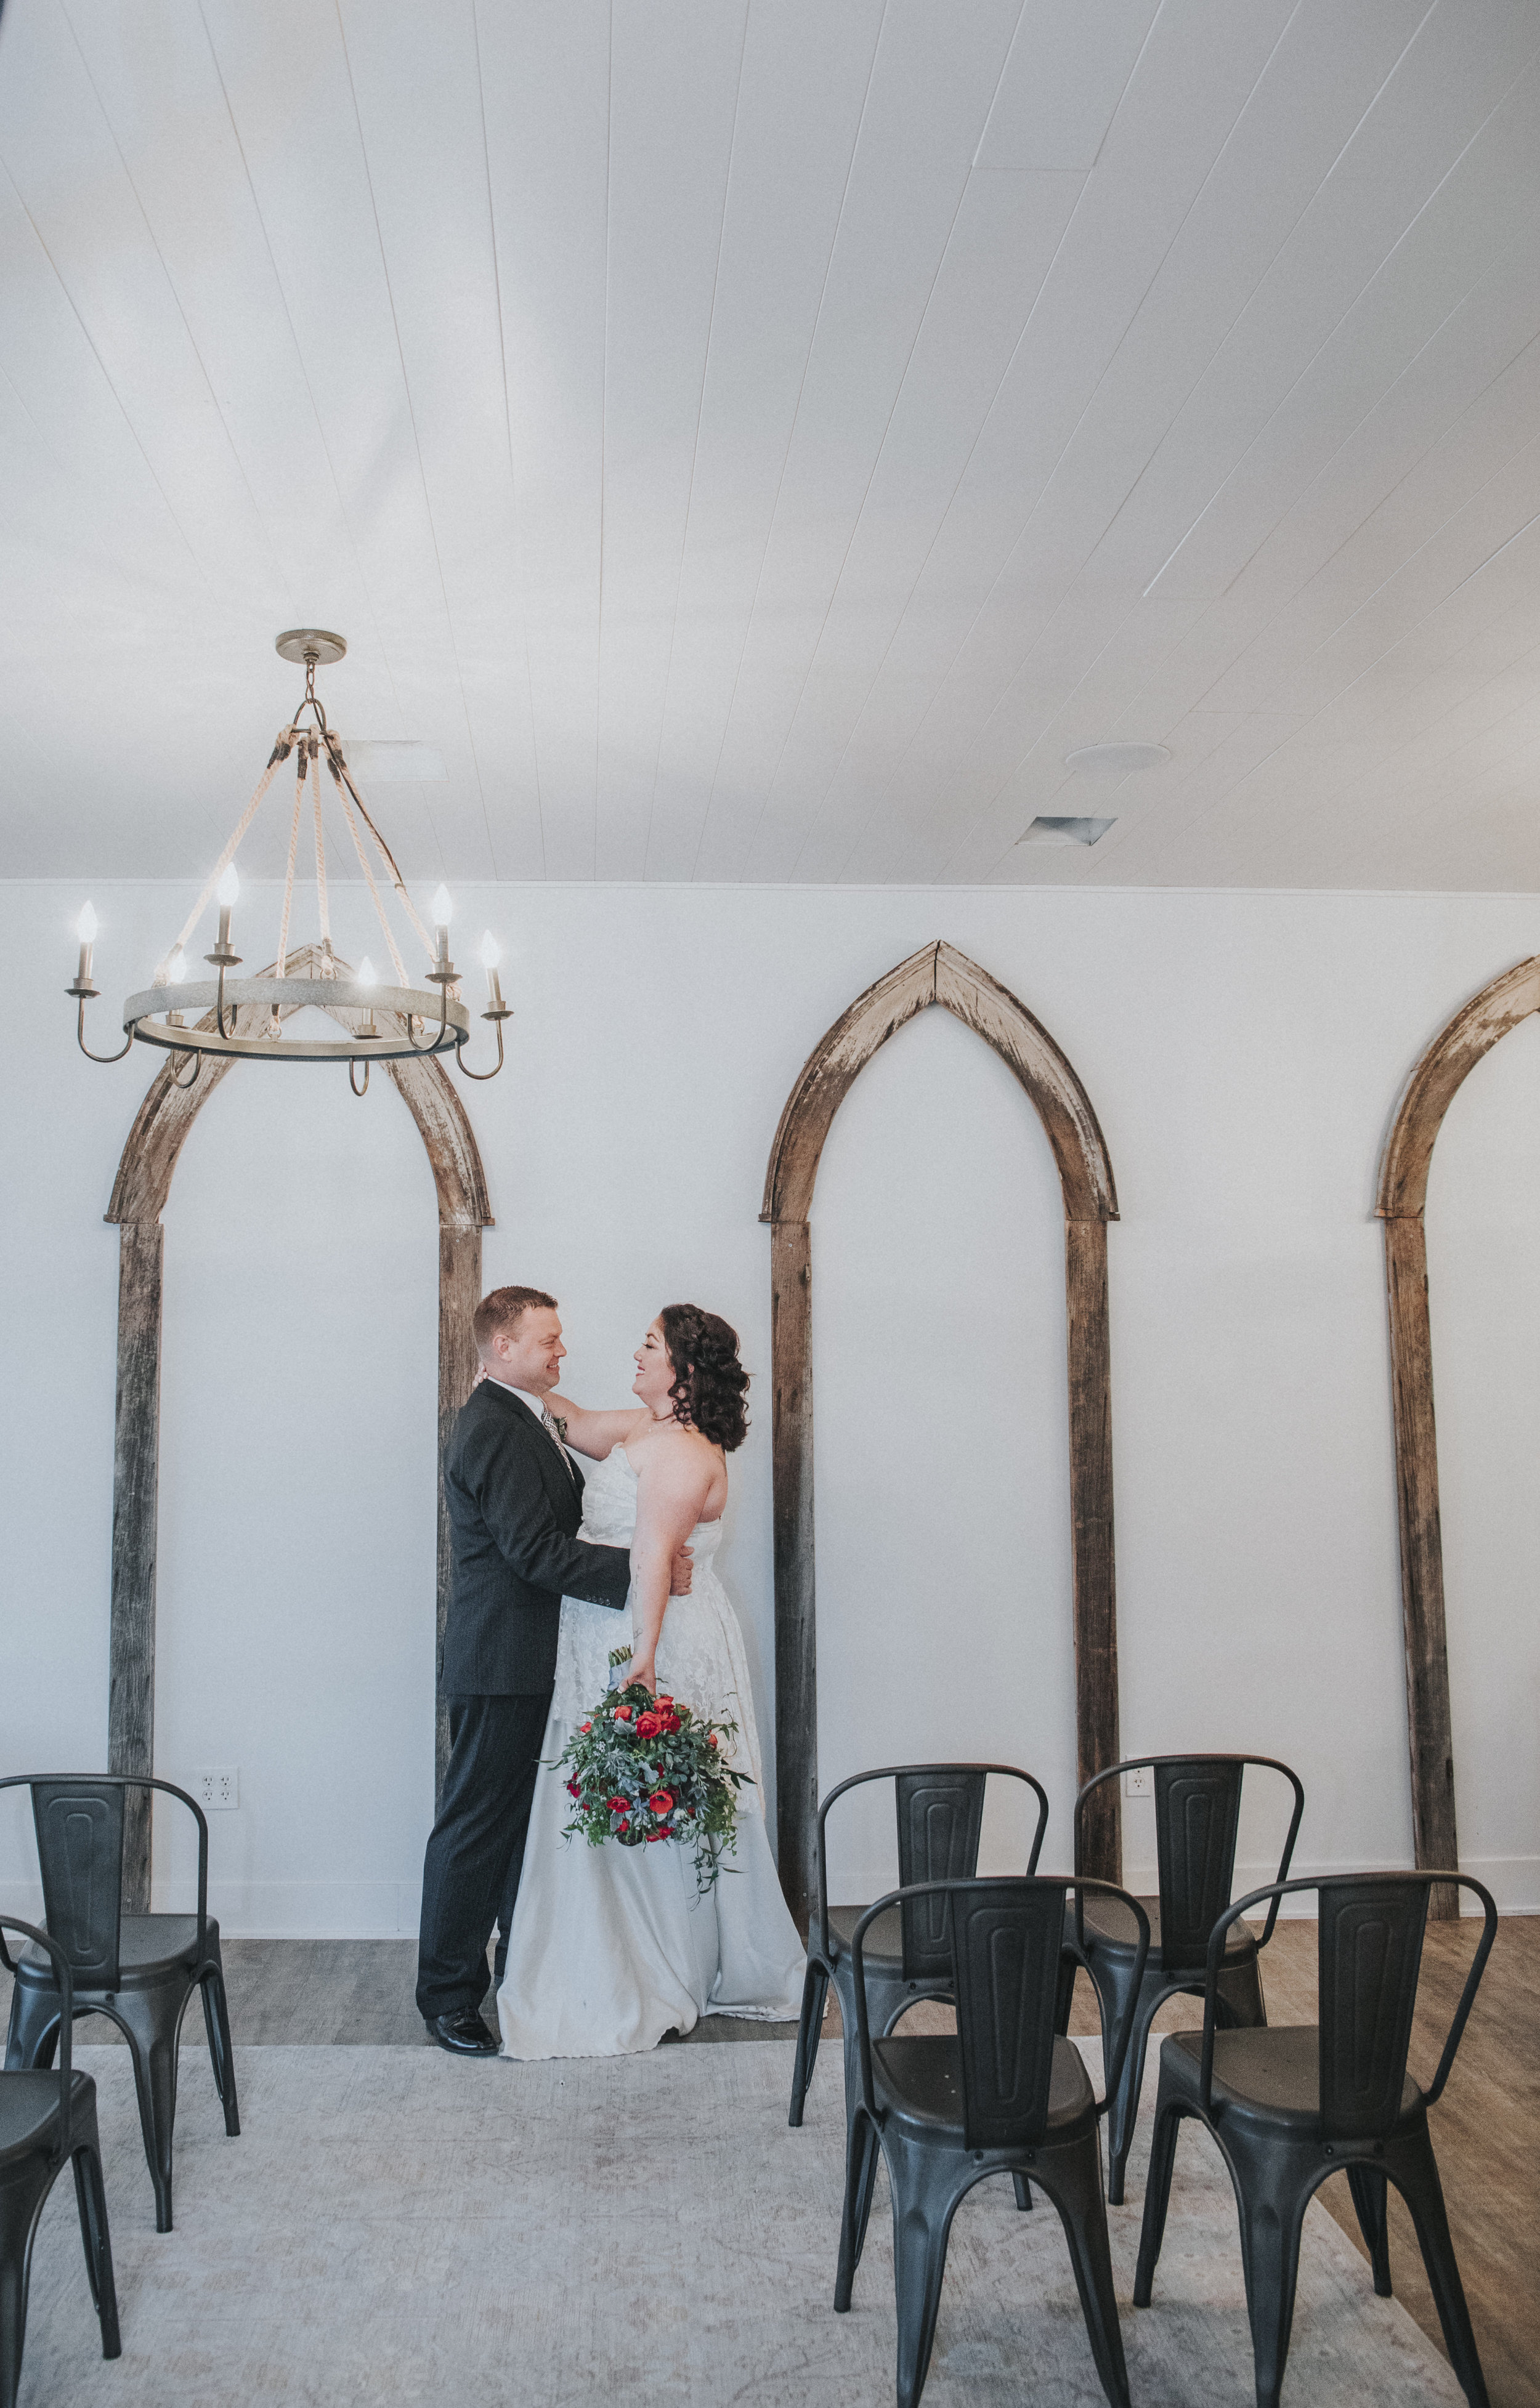 97 midwest-colorado-nebraska-elopement-photography-gretna-turtledoves.jpg